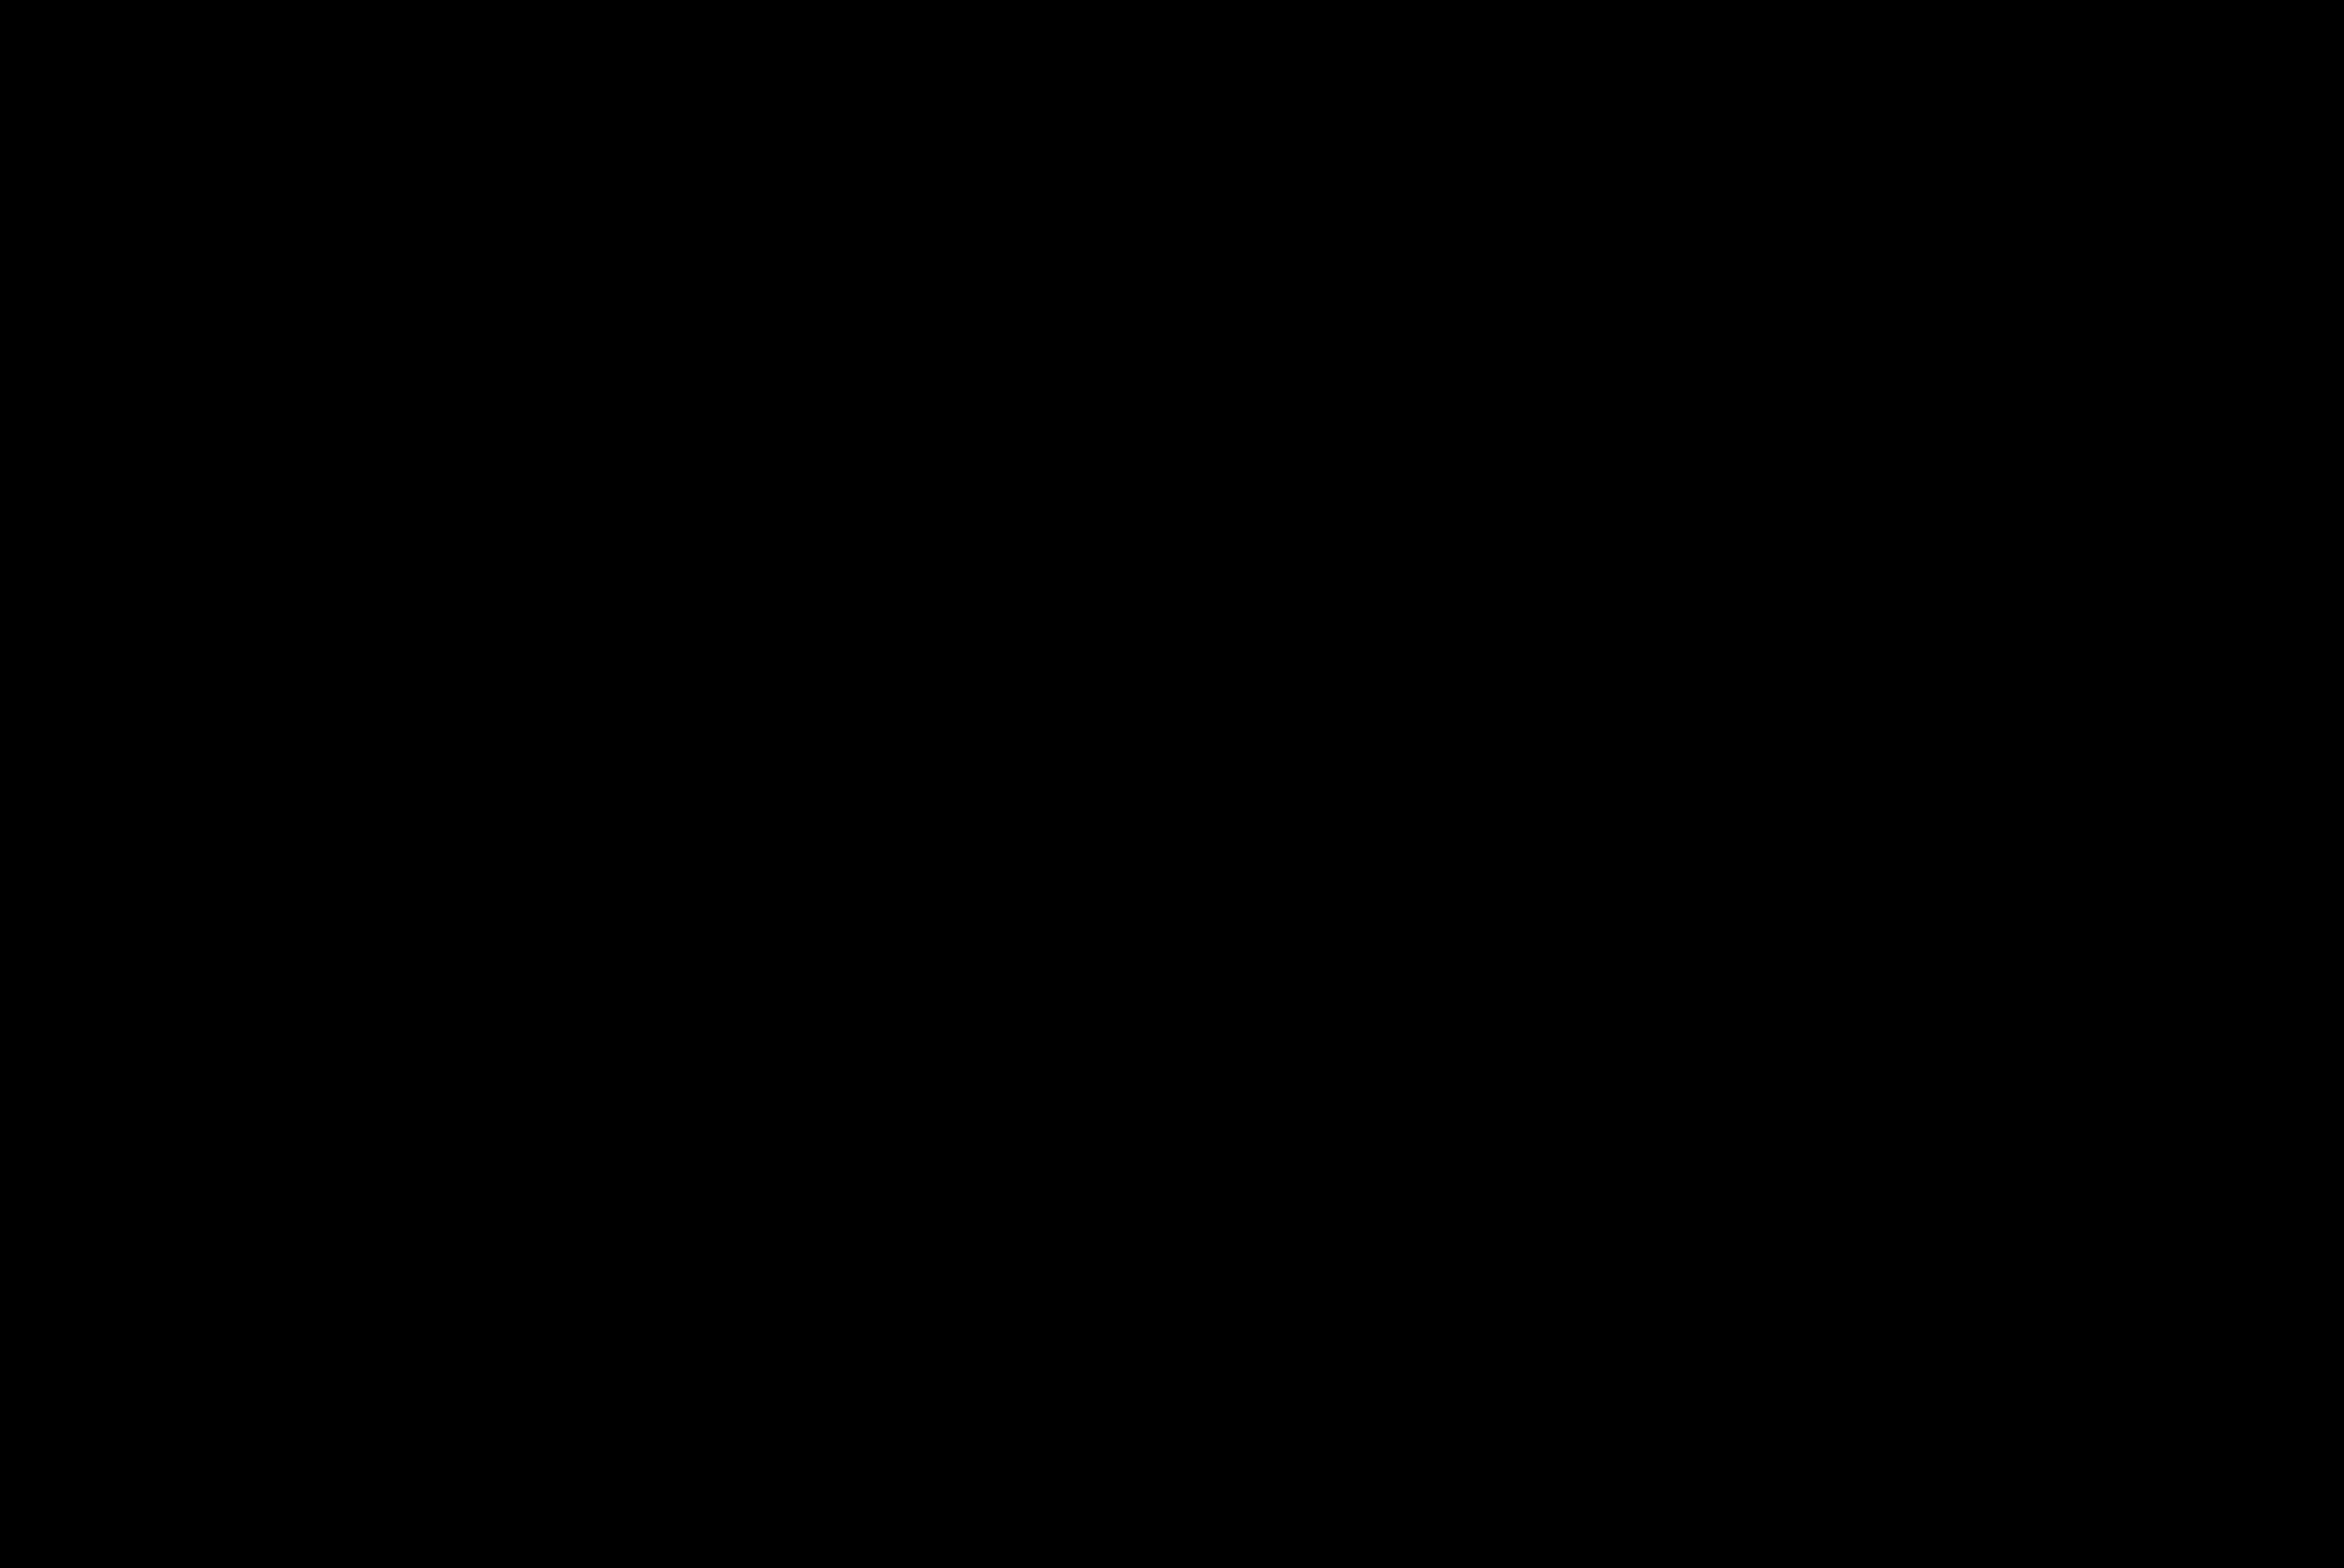 Clipart door rectangular object. Rectangle shaped building big